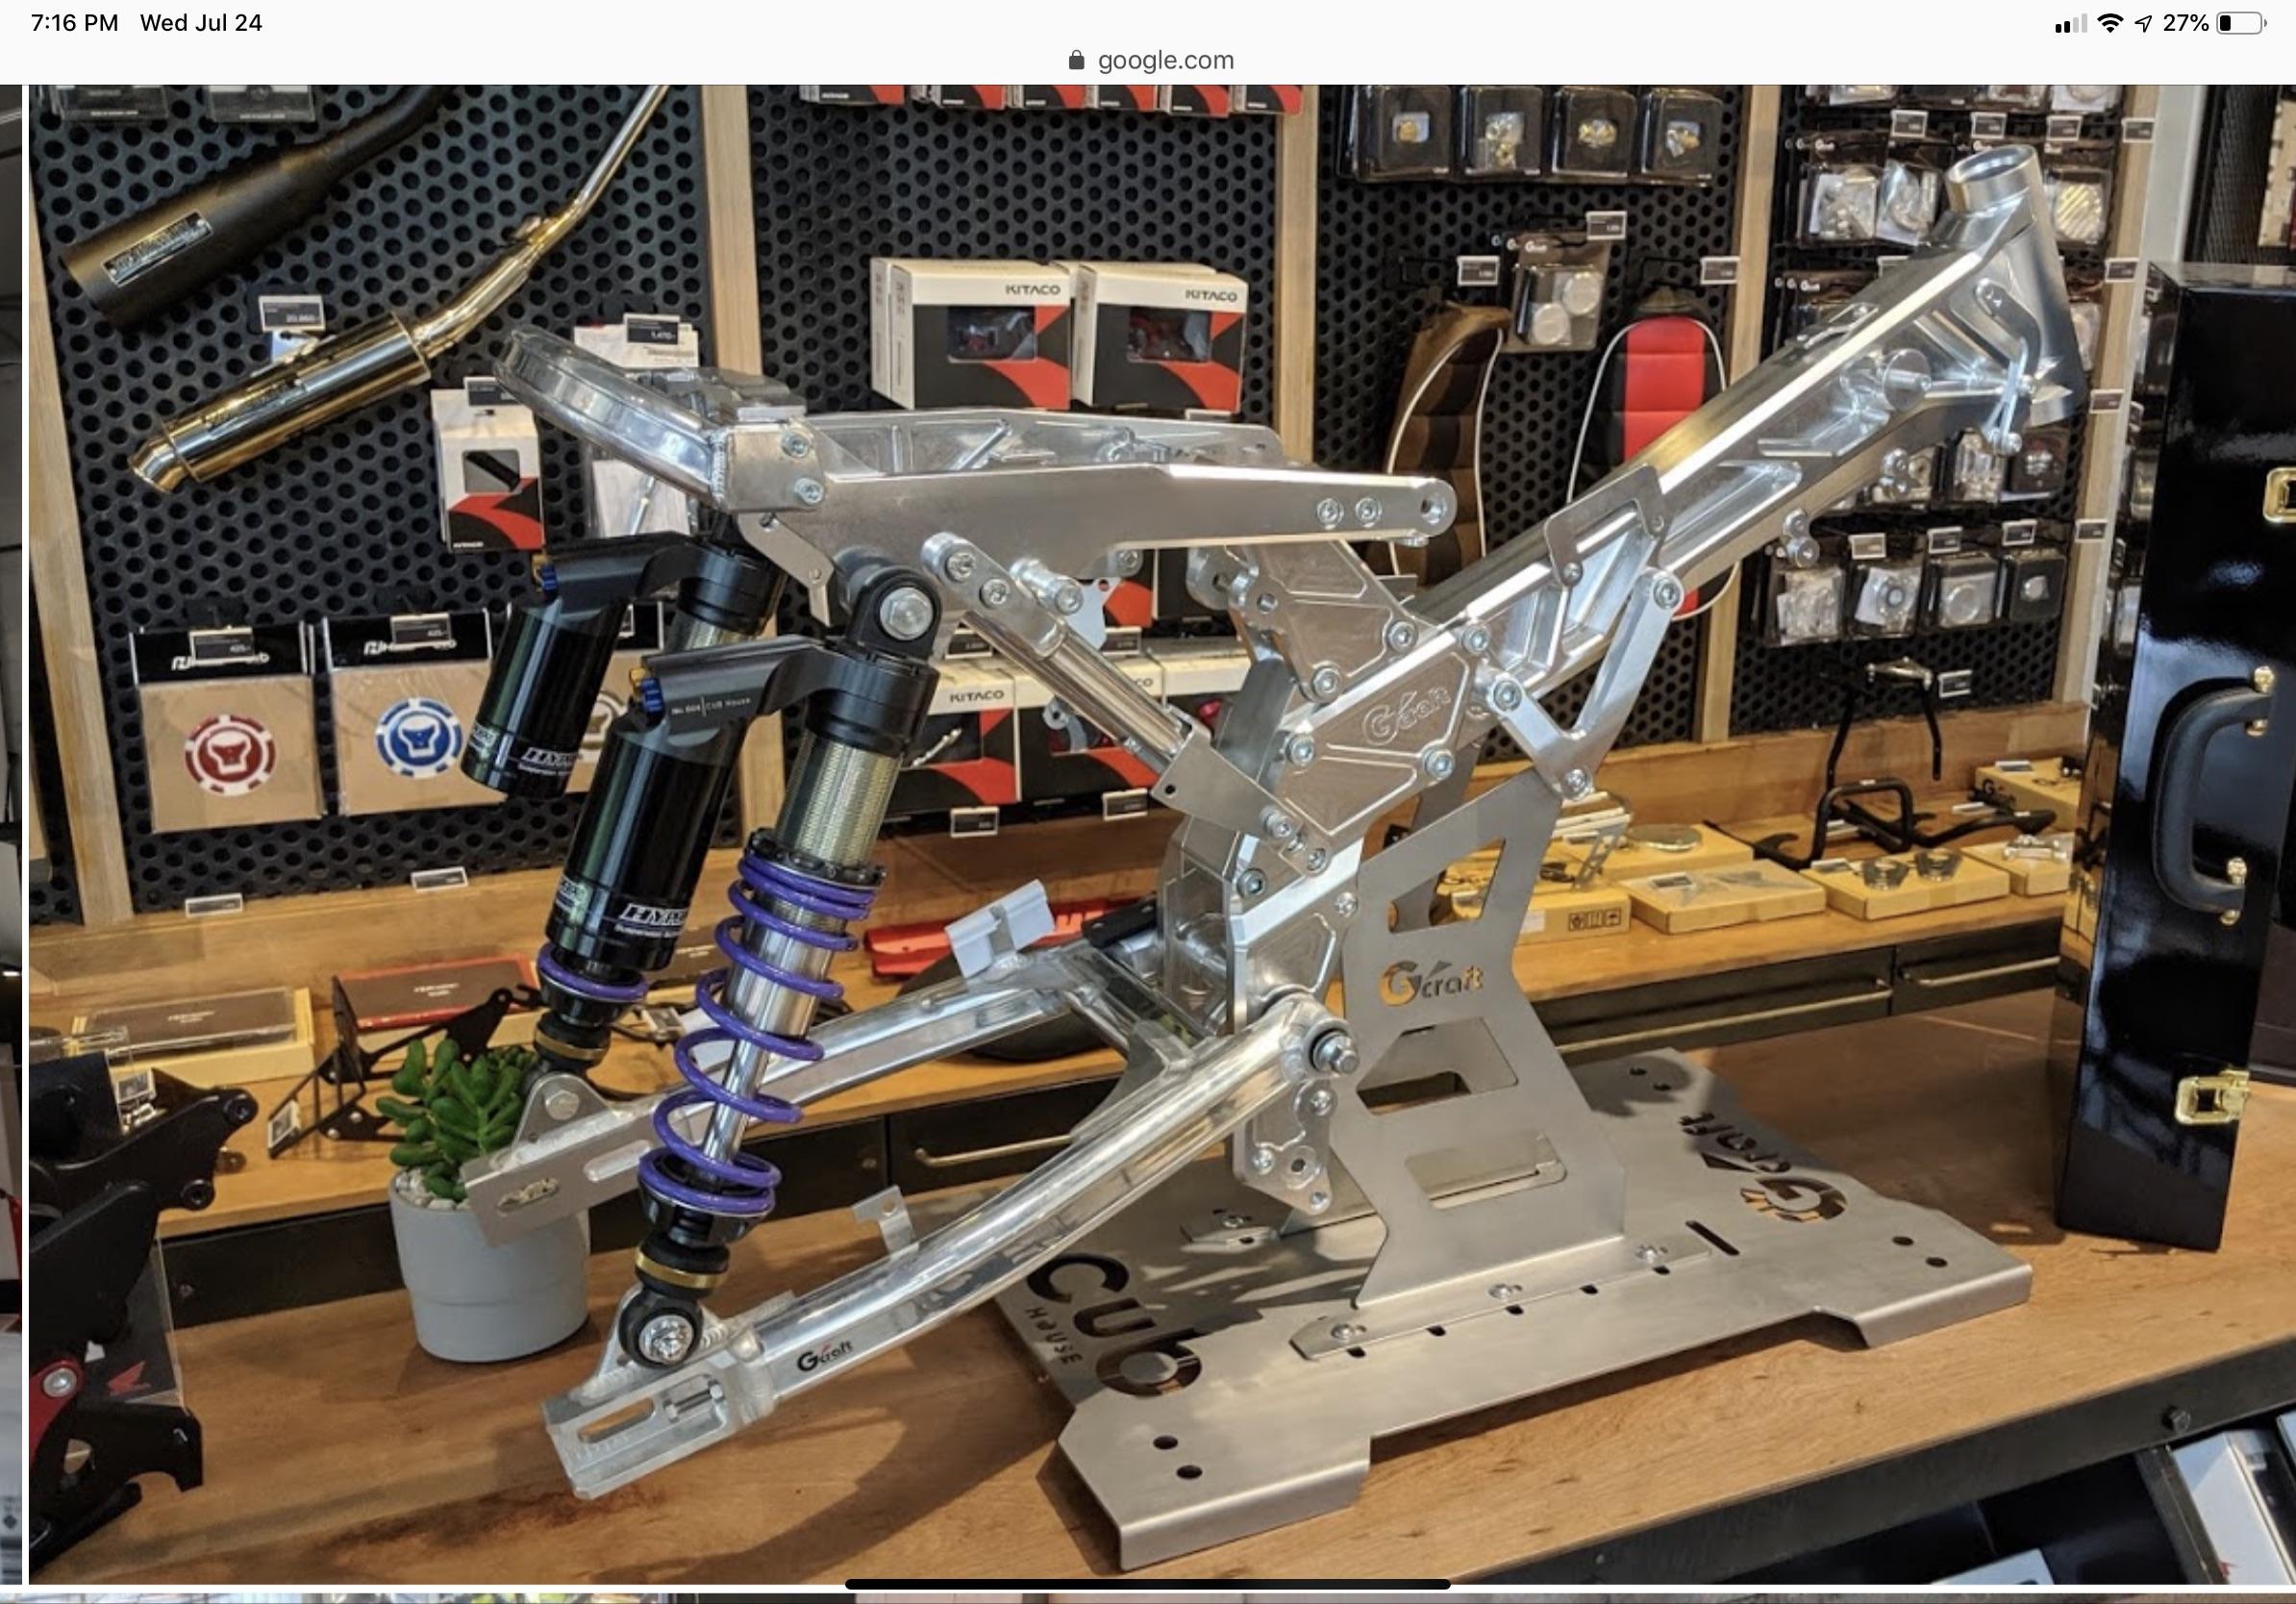 Aluminum G Craft Monkey frame omg so sexy-42478a71-03bc-468d-a045-b62ef0d82221.jpeg